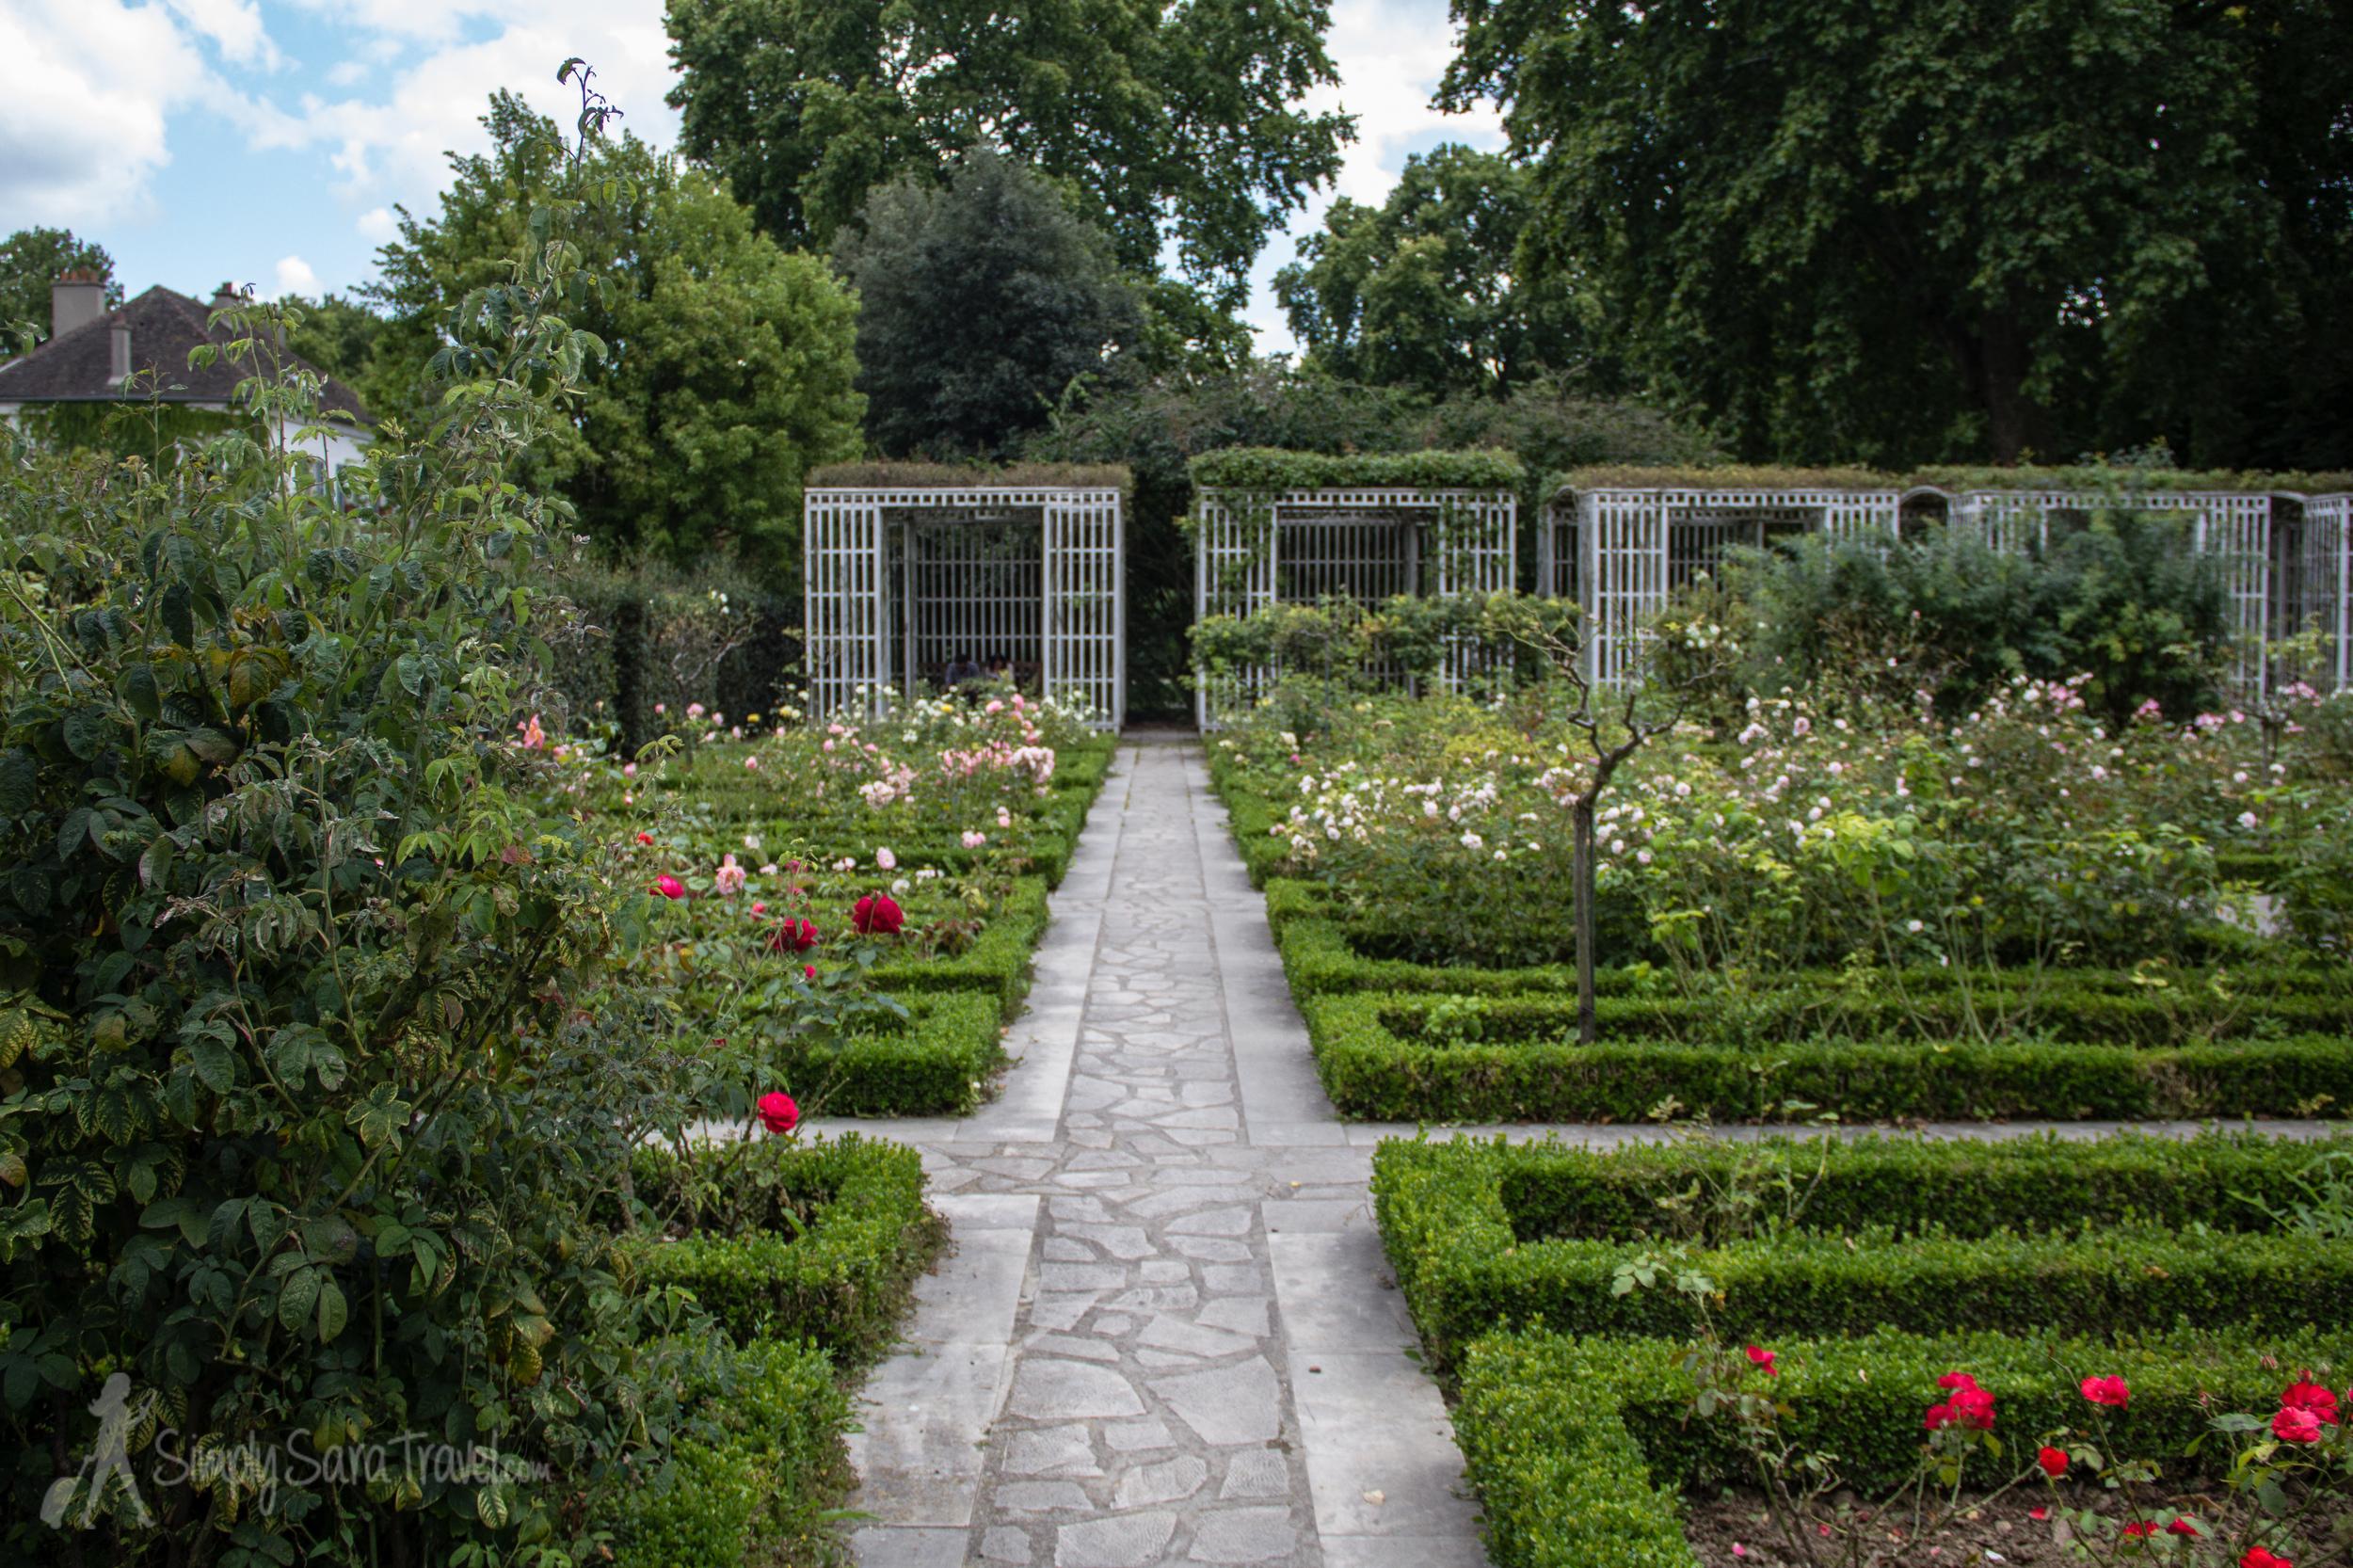 One of the nine formal gardens in theJardin Yitzhak Rabin